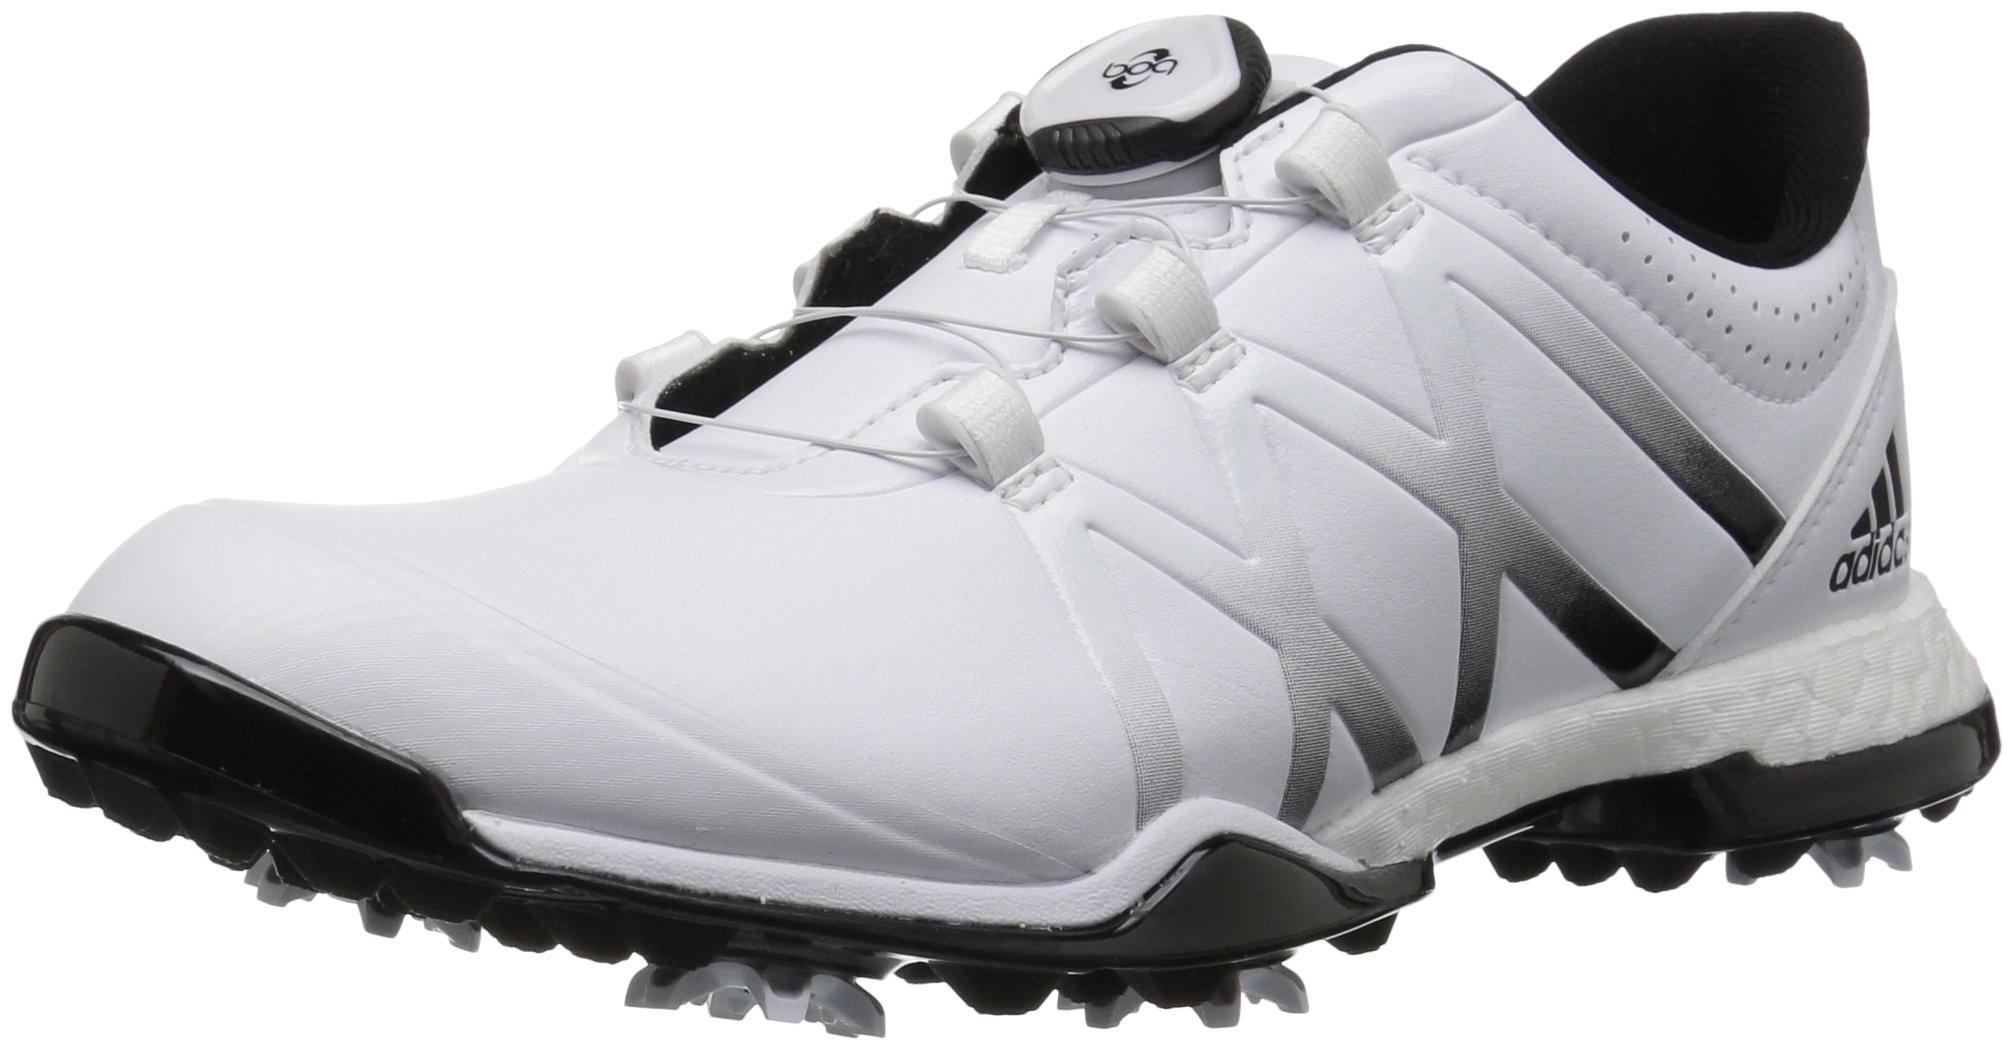 adidas Women's Adipower Boost BOA Golf Shoe, White/Black, 8.5 M US